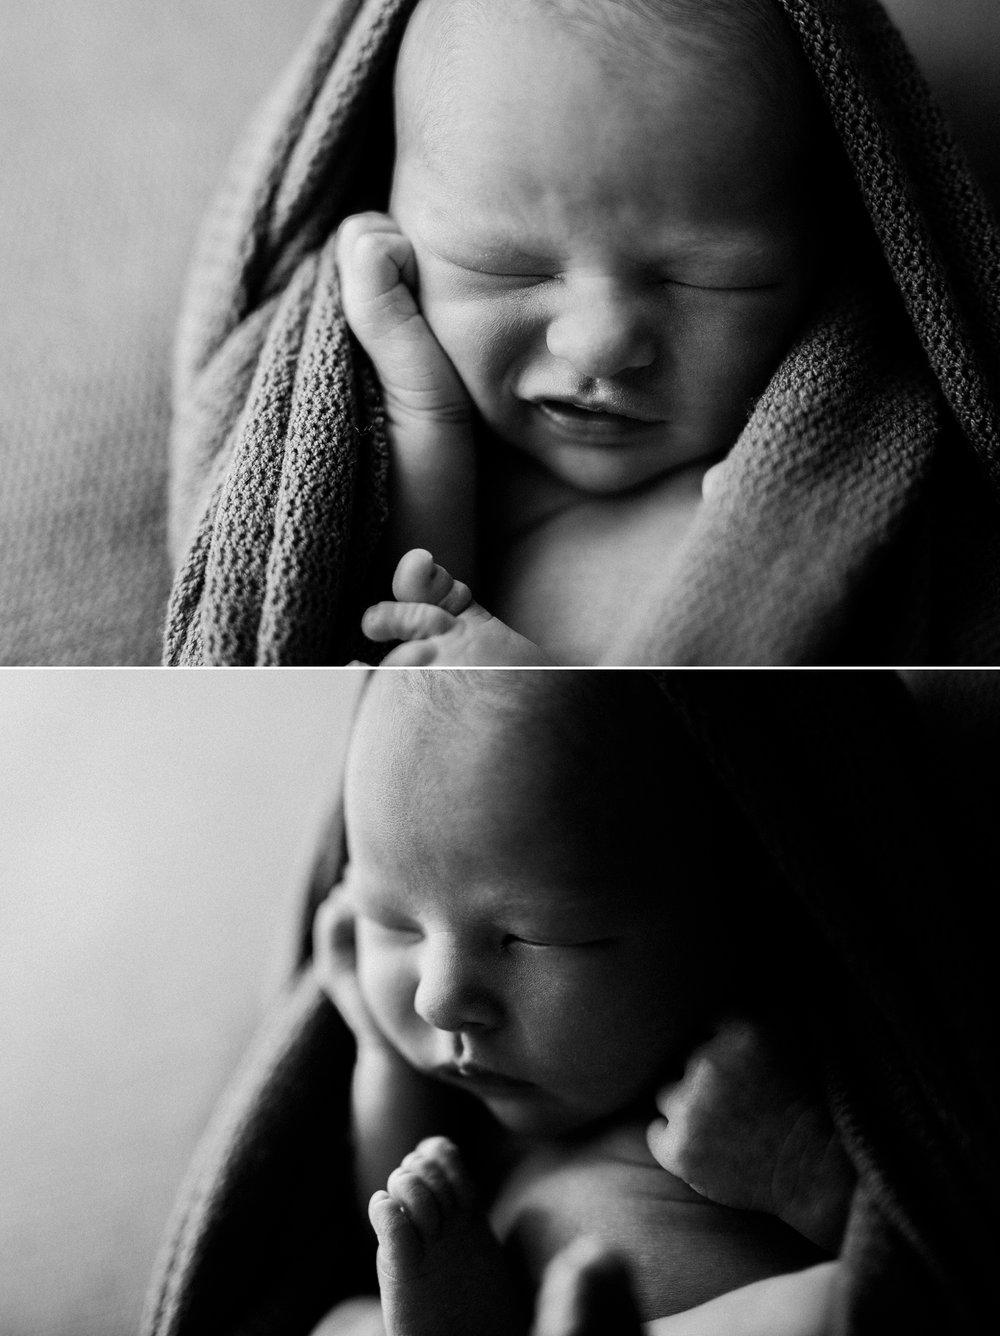 Sebastian - Natural light newborn photographer in Adelaide - Simple newborn photography - Katherine Schultz www.katherineschultzphotography.com 13